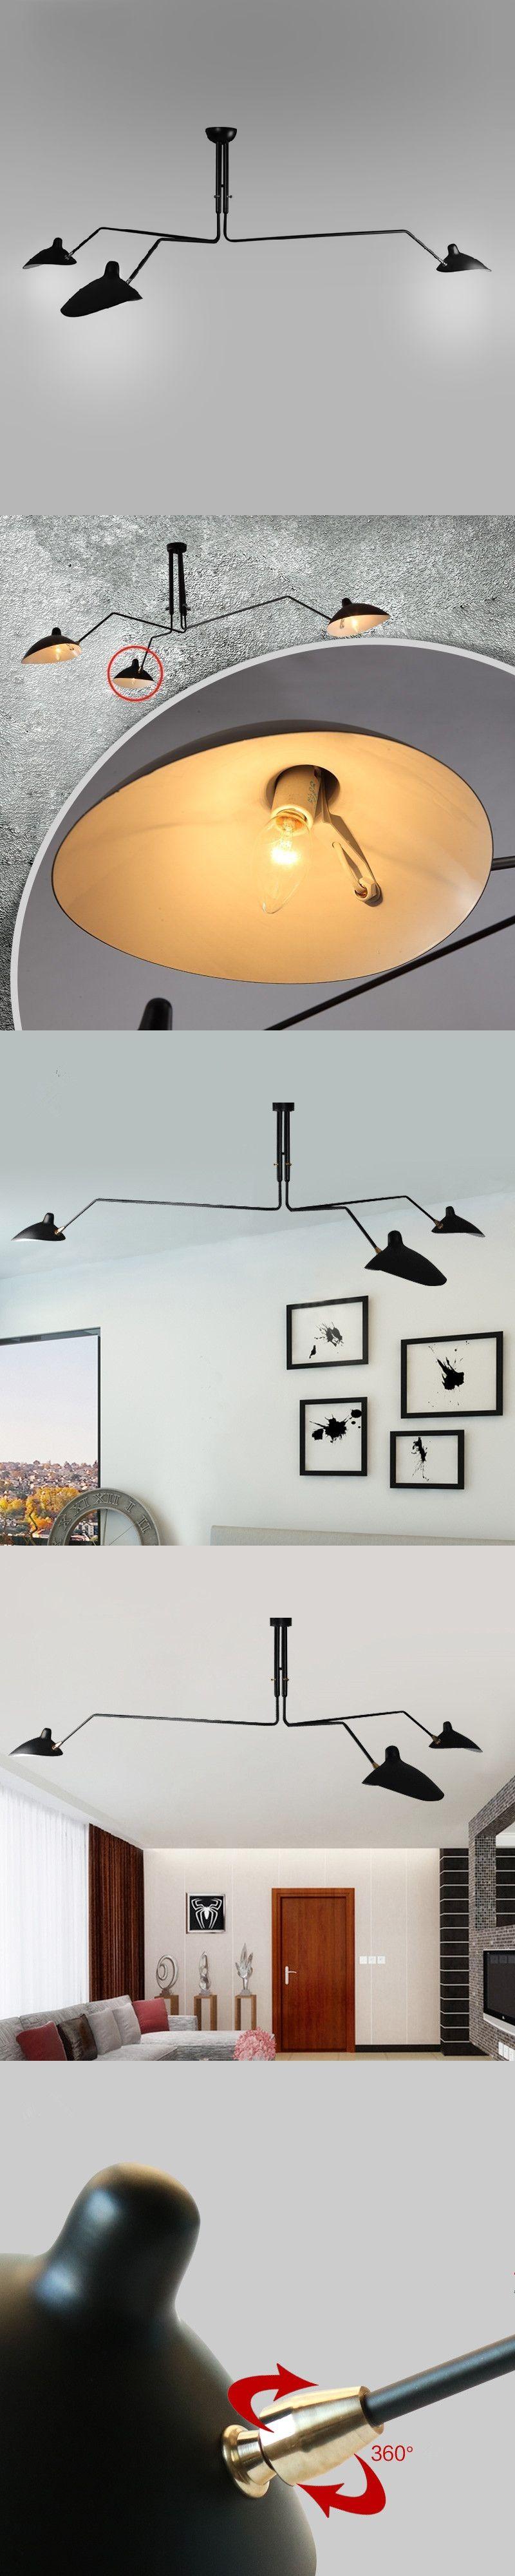 Modern Nordic Serge Mouille Chandelier Lighting Kitchen Dining Room Table Black Ceiling Lamp Light Fixtures DIY